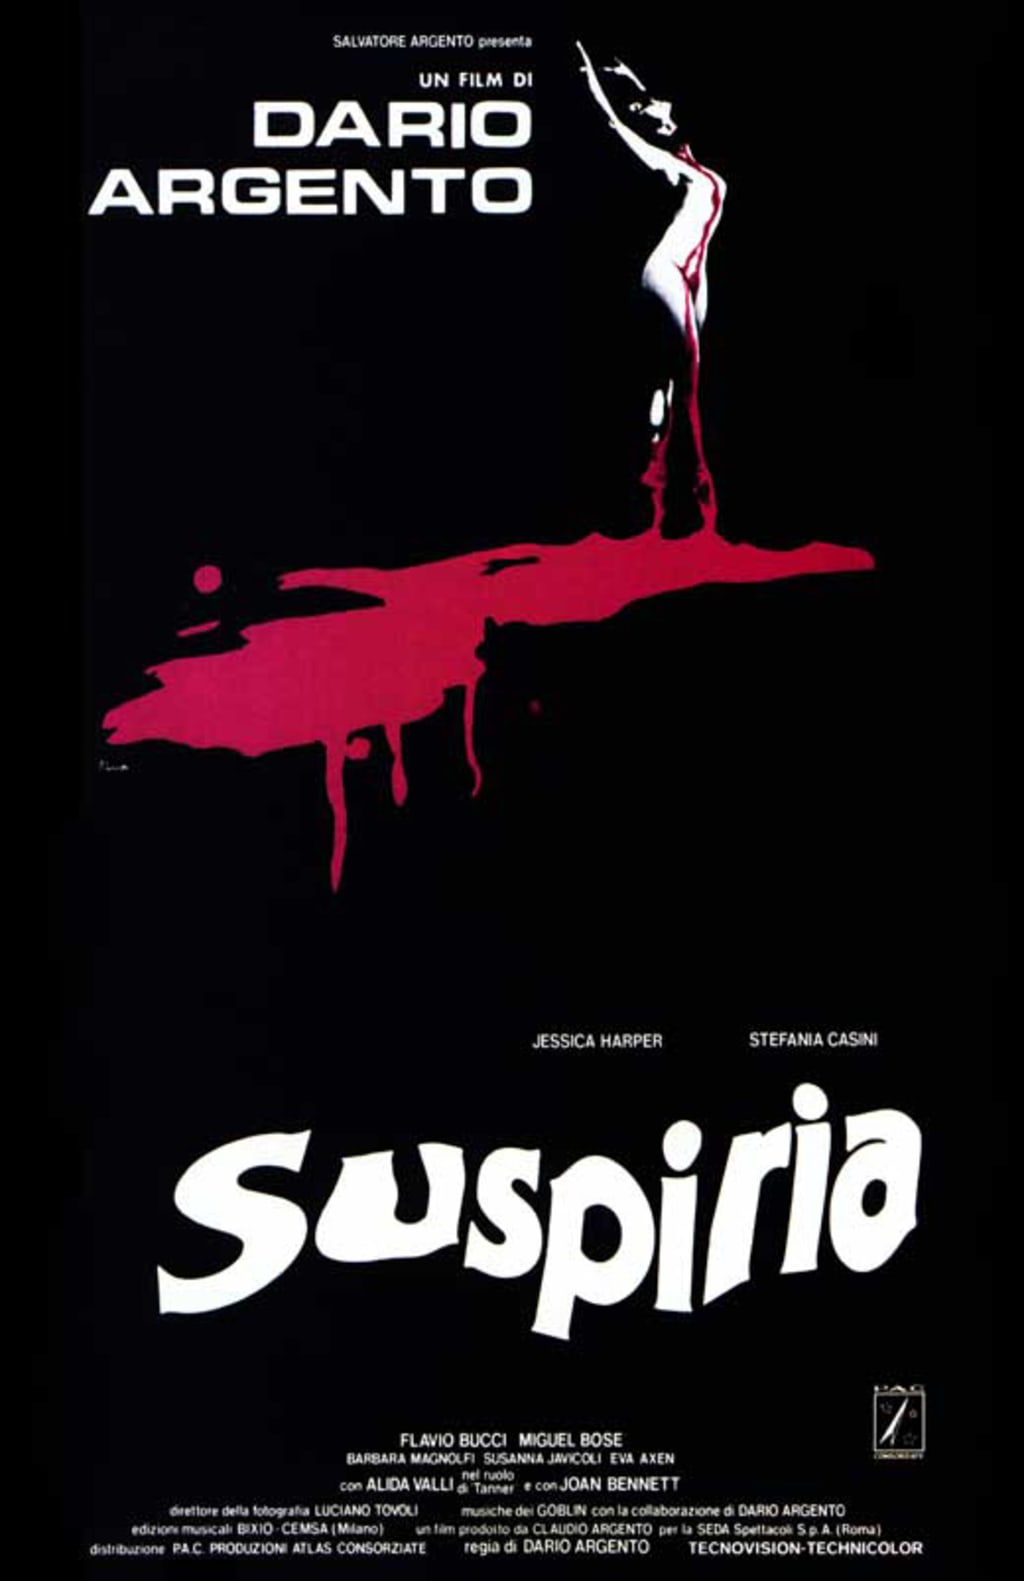 Reed Alexander's Horror Review of 'Suspiria' (1977)